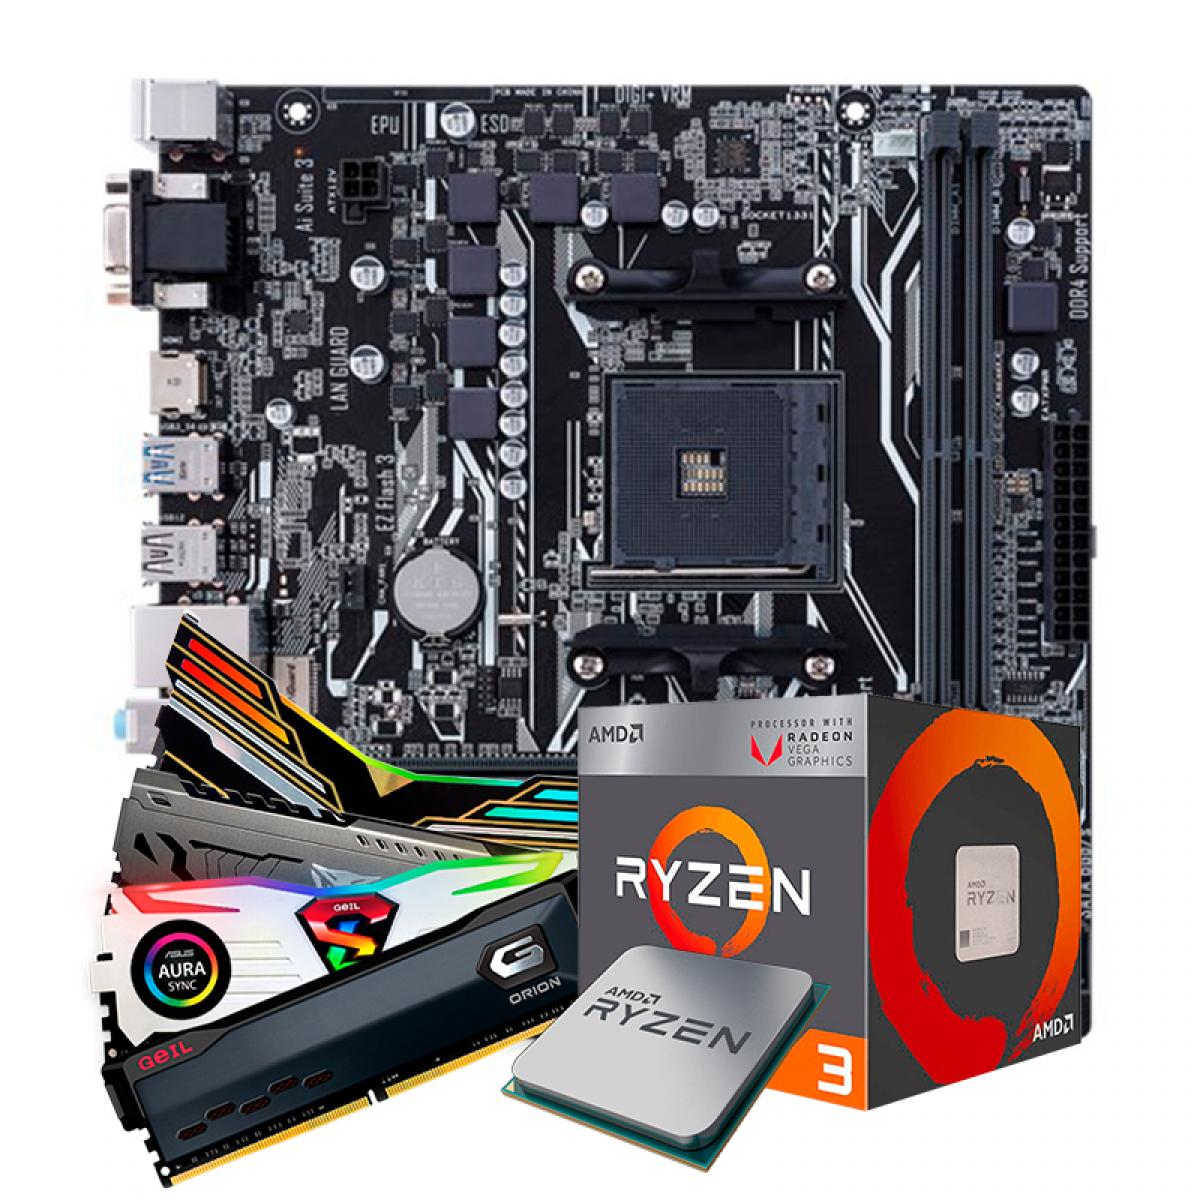 Kit Upgrade, AMD Ryzen 3 2200G, ASUS Prime A320M-K, Memória DDR4 8GB 3000MHz